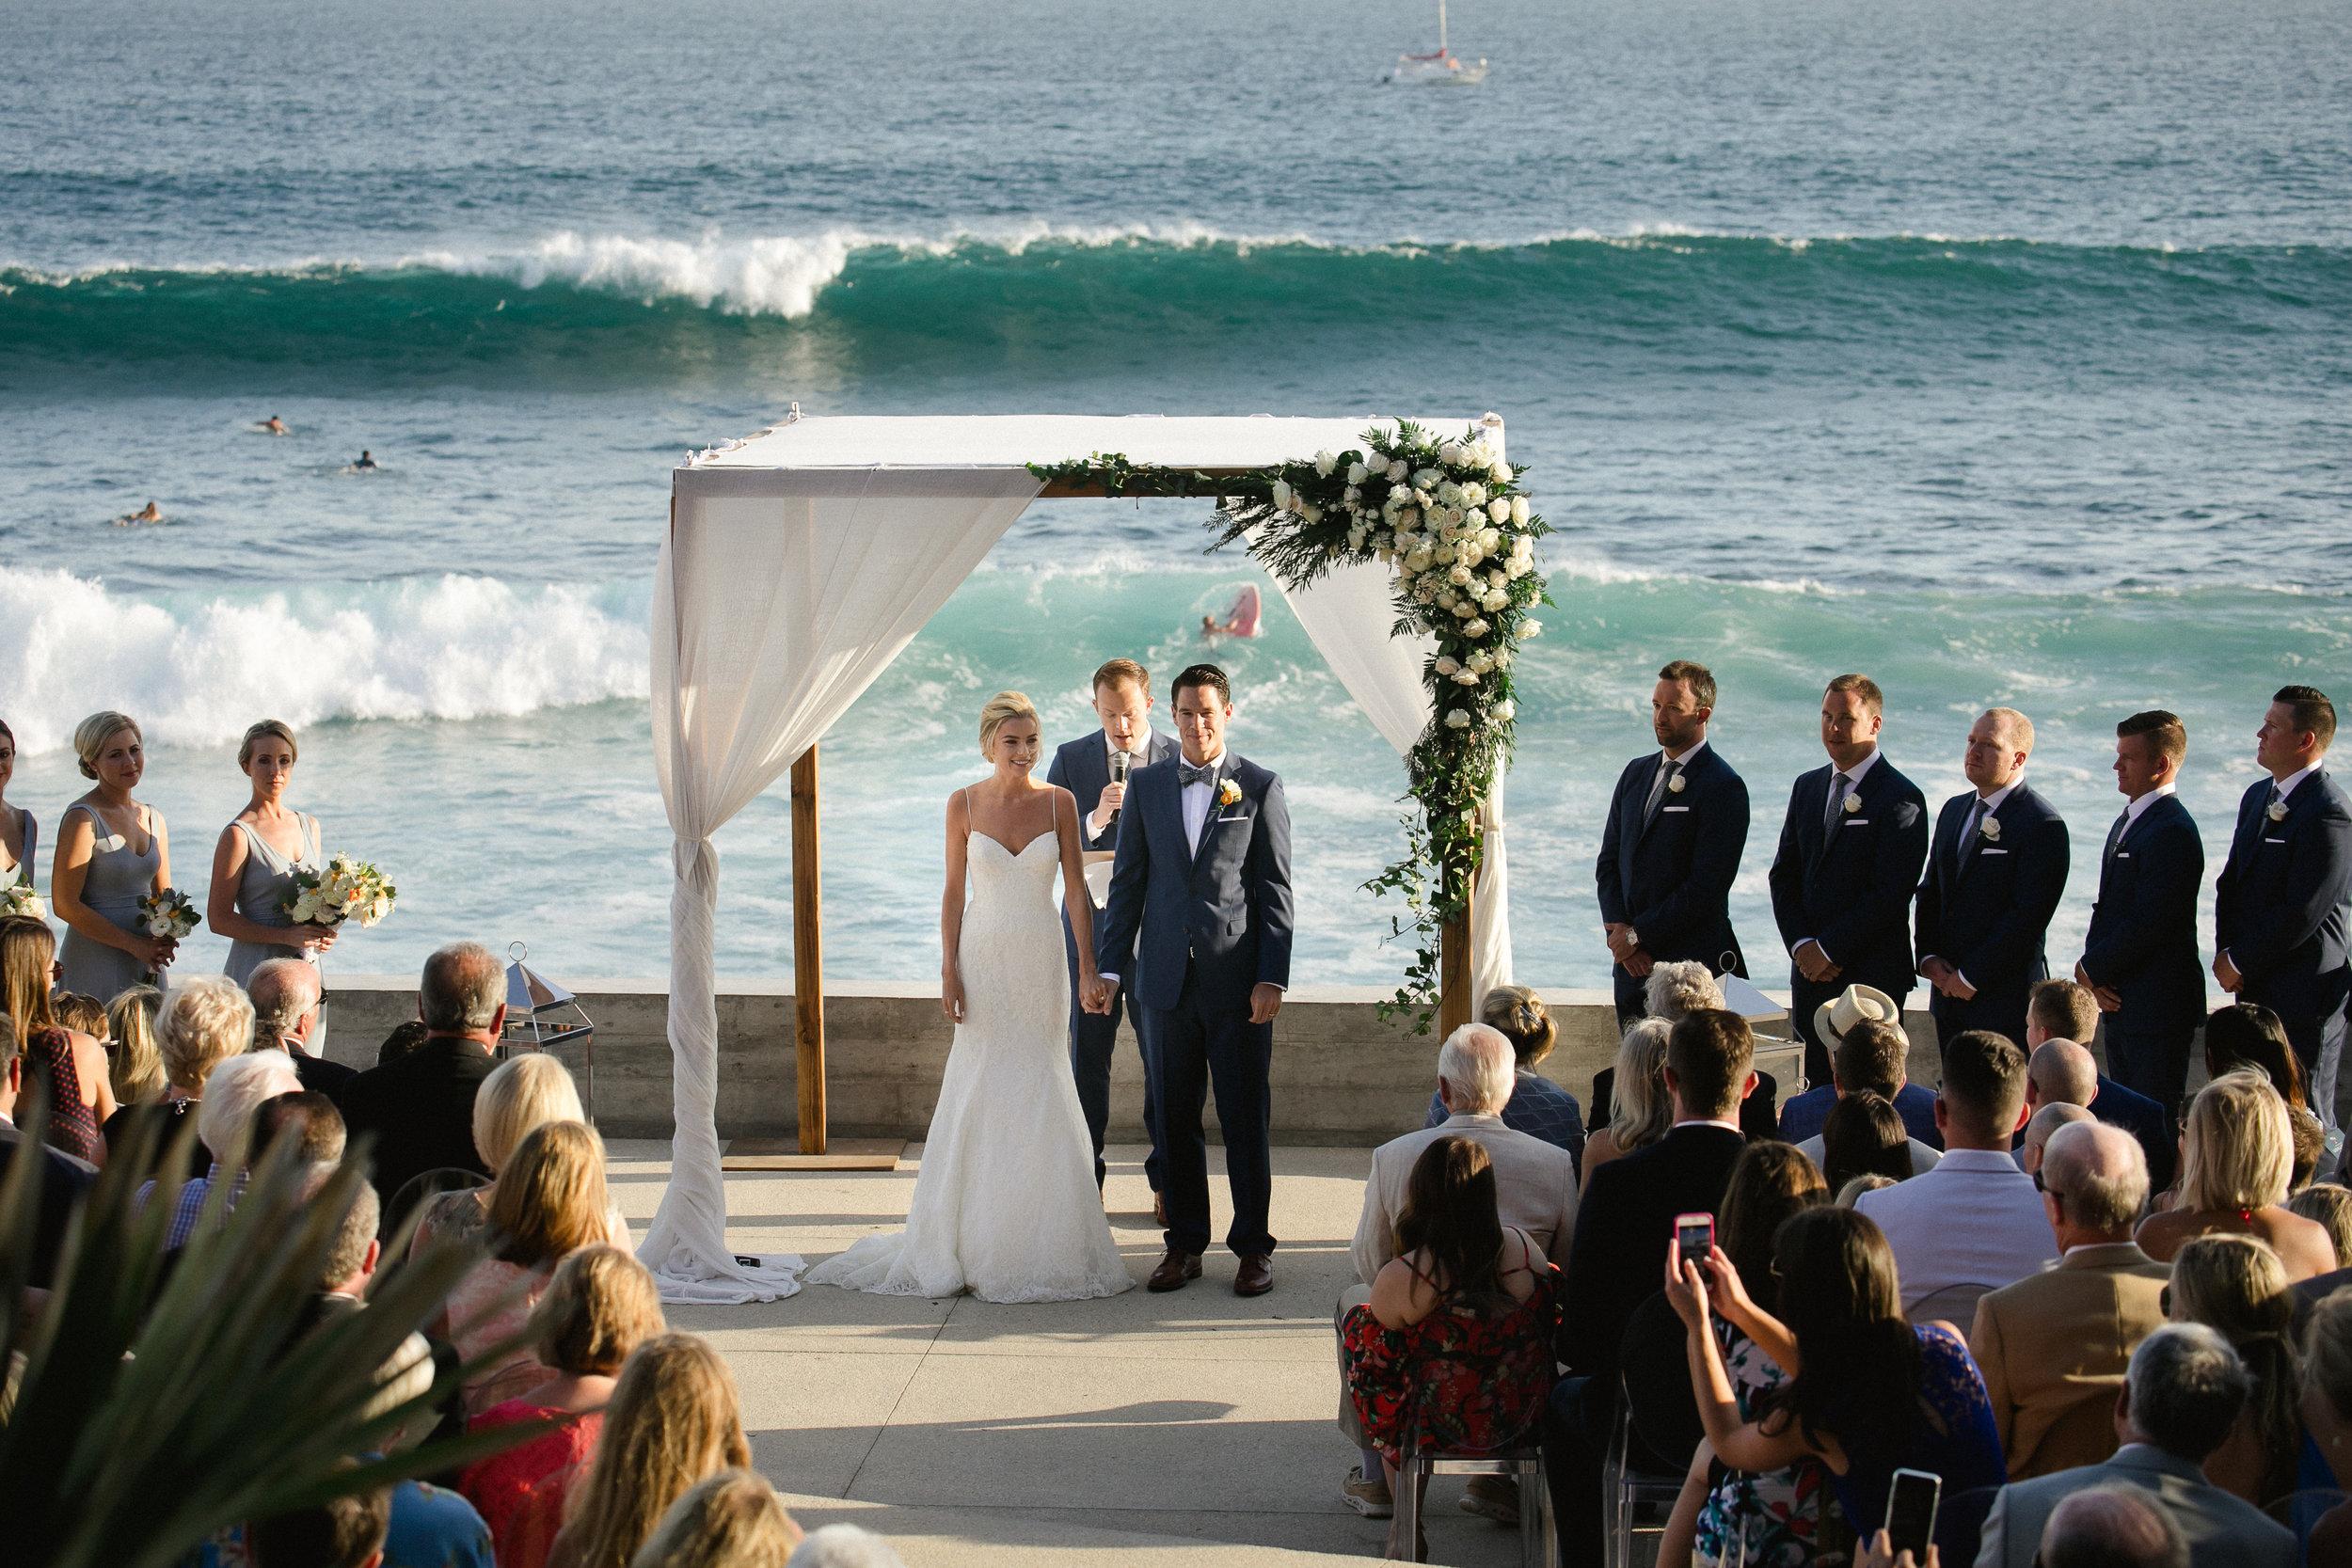 Clicks by Chris+Lynn | Wedding Planner Karla Casillas and Co.